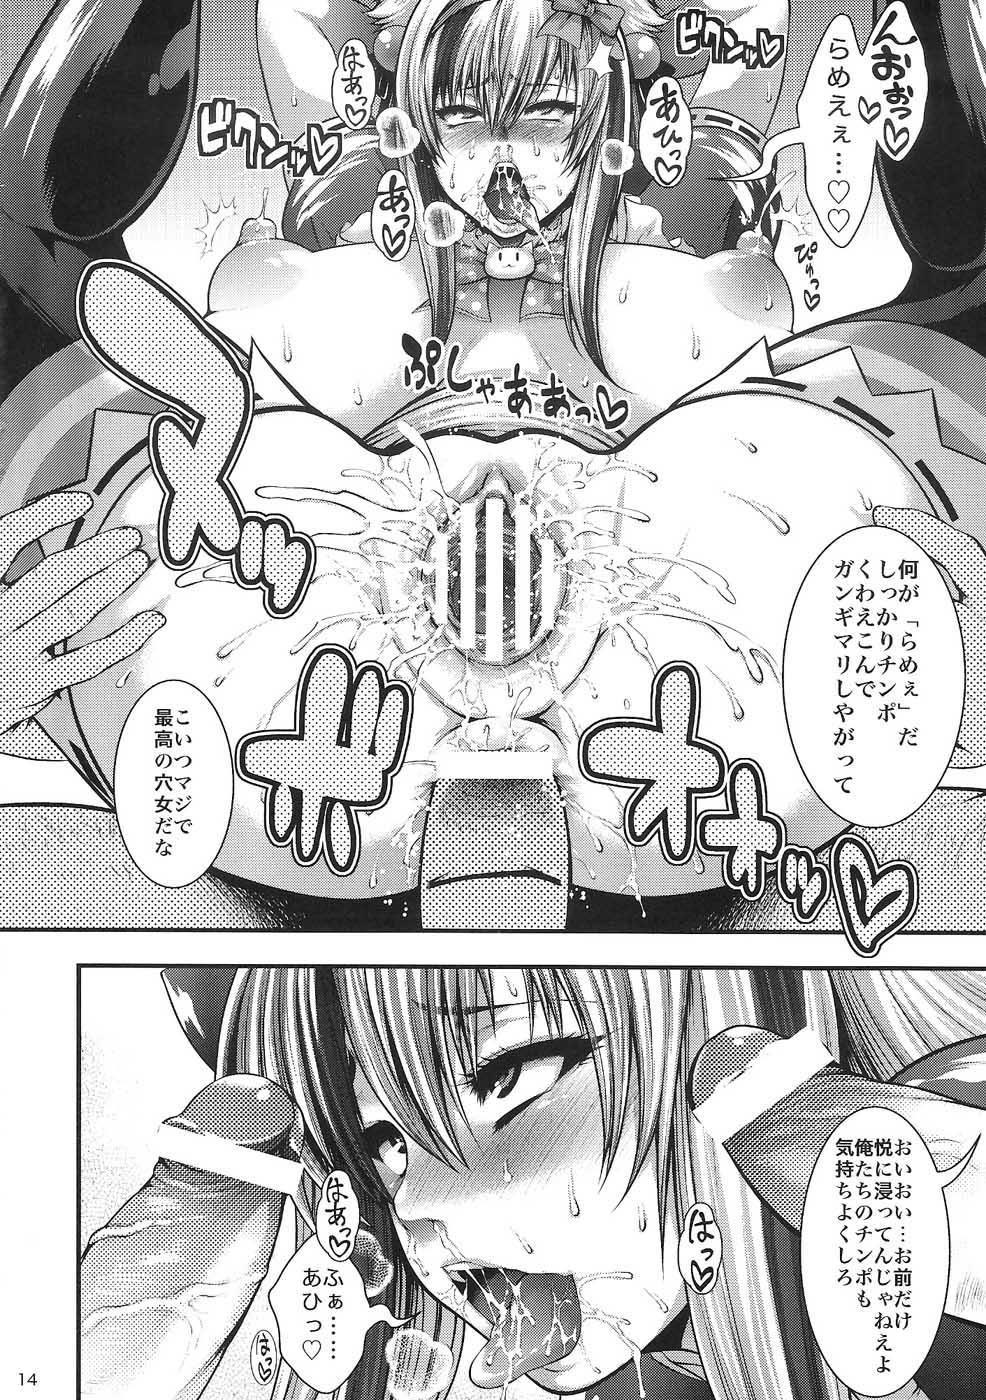 Chinpo ni Totsugeki! Denpa Hime! 12